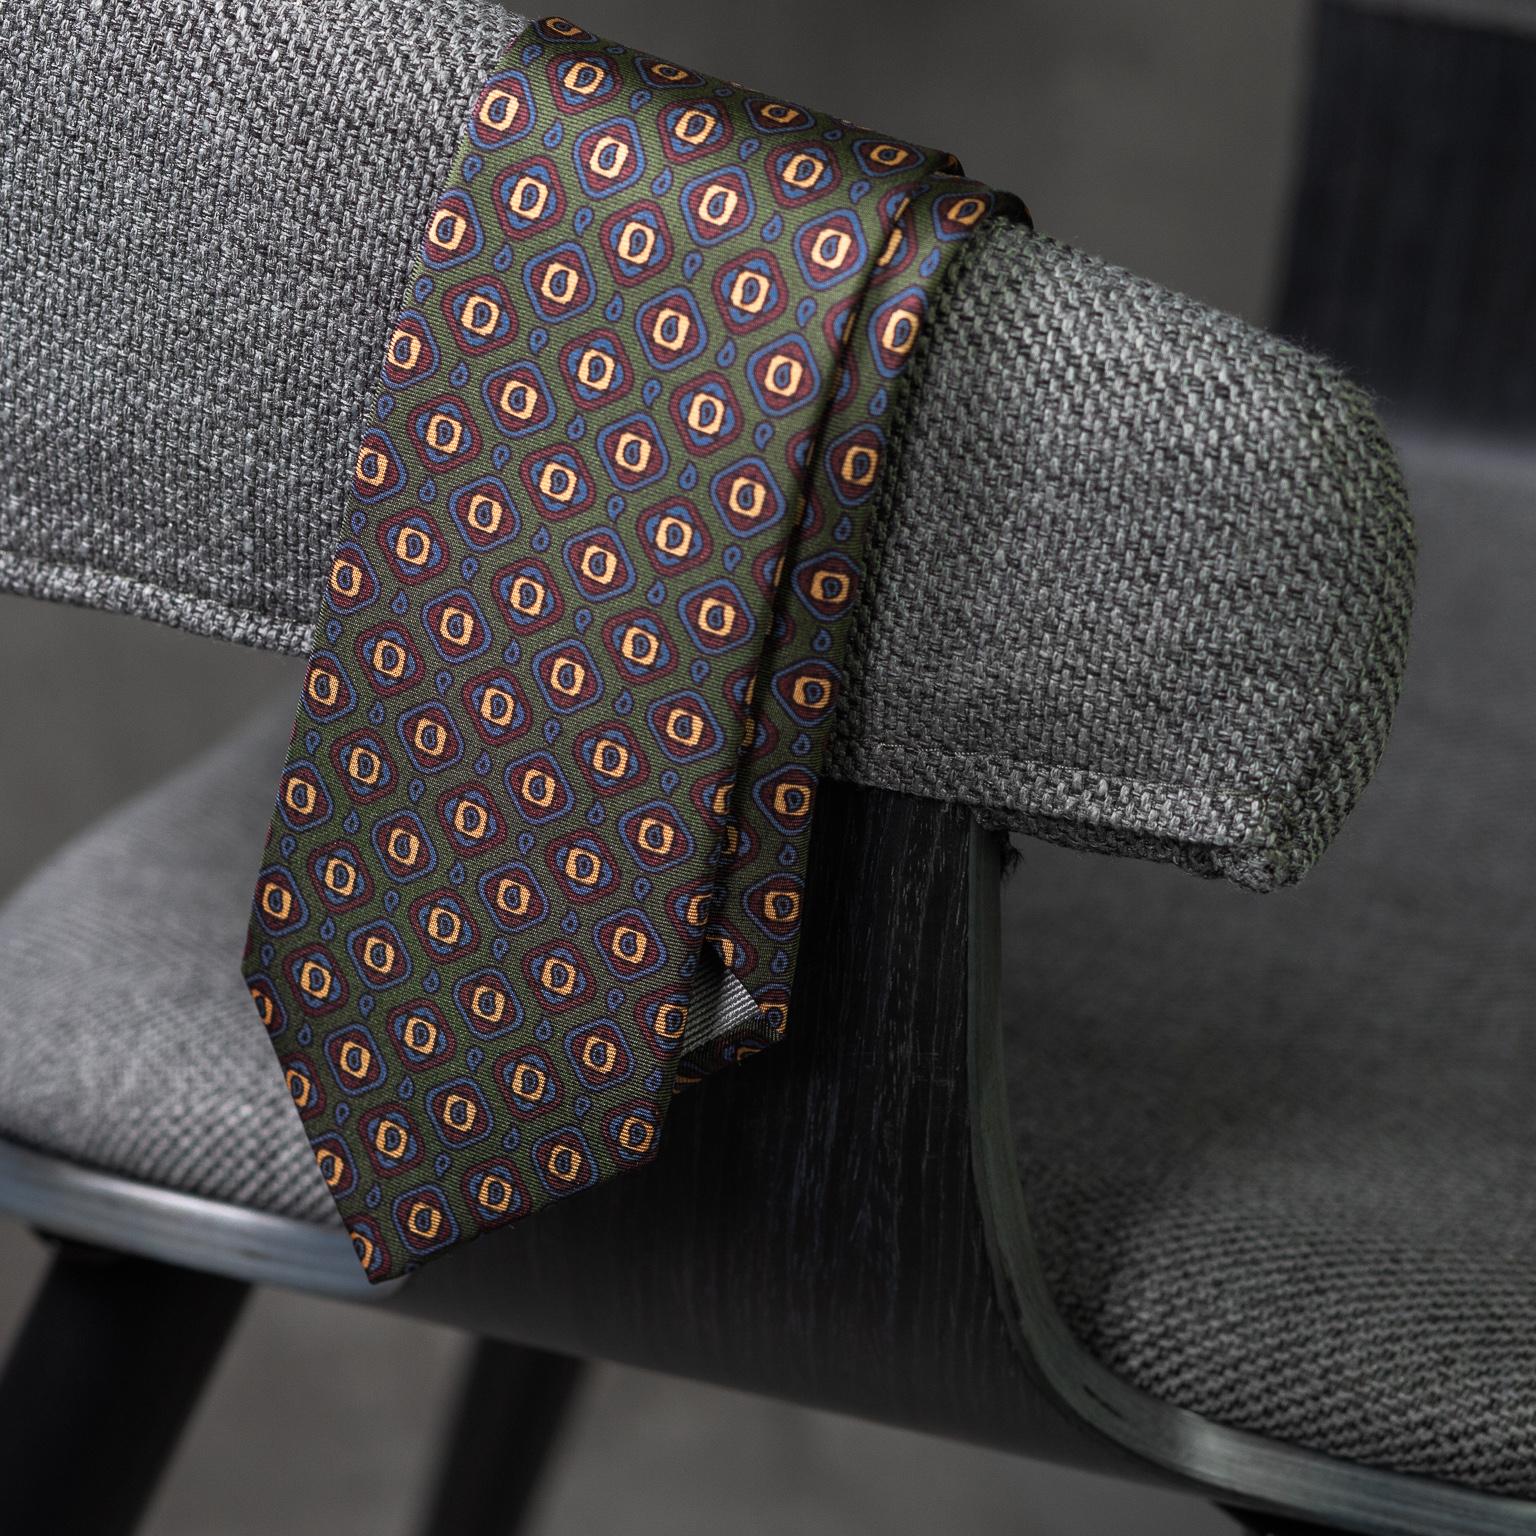 PRINTED-SILK-SEDA-ESTAMPADA-0579-Tie-Initials-Corbata-Iniciales-The-Seëlk-3